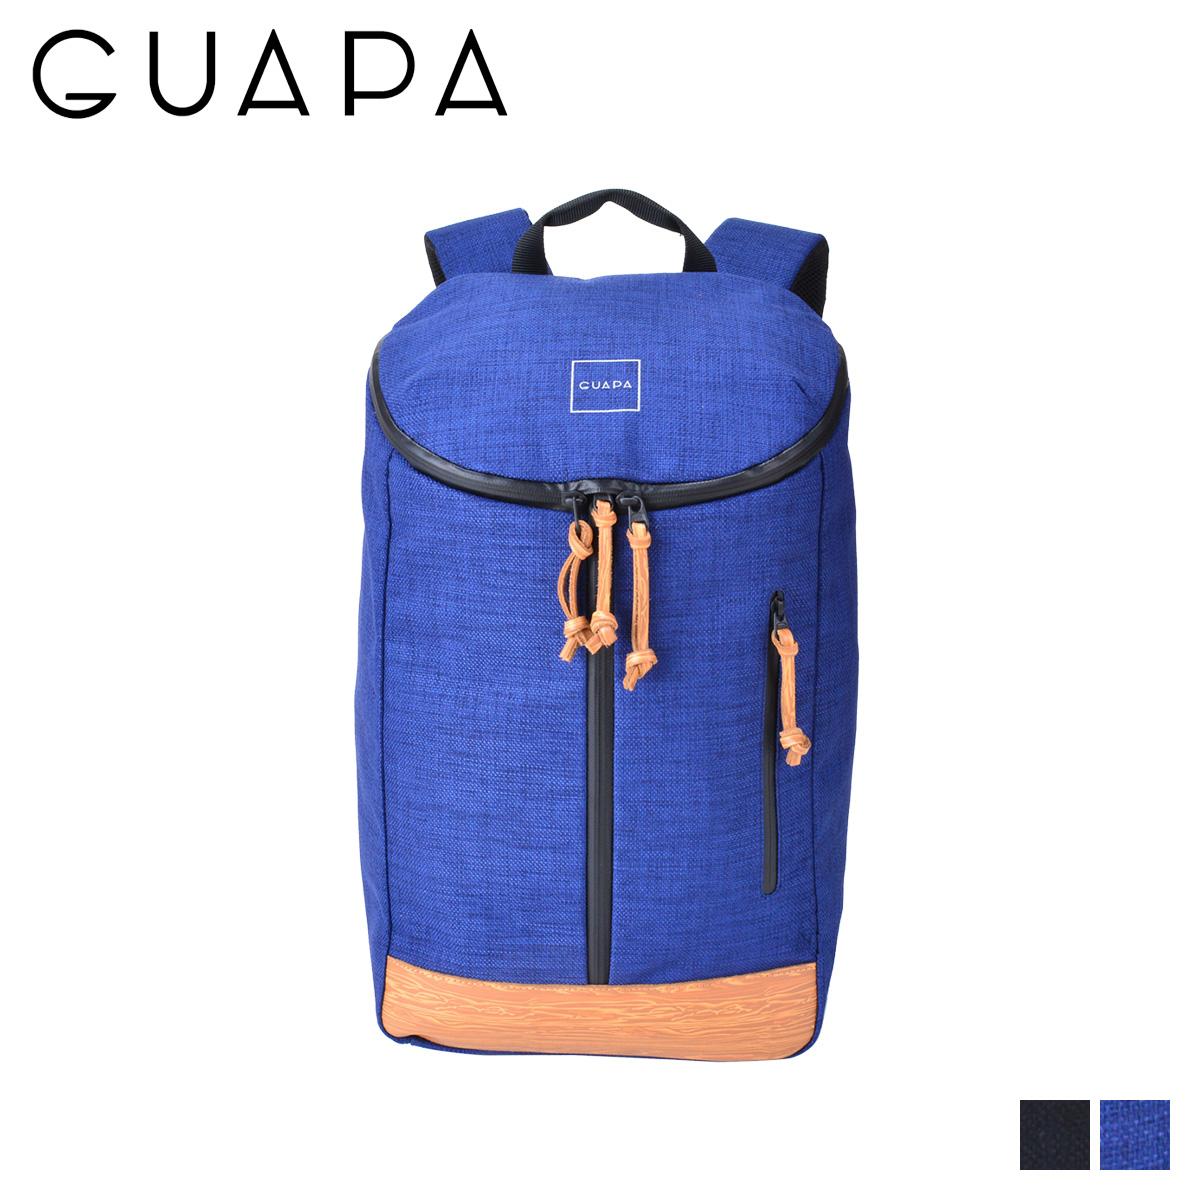 GUAPA DONAU SERIES グアパ リュック バッグ バックパック メンズ レディース 18L ブラック ネイビー 黒 51004